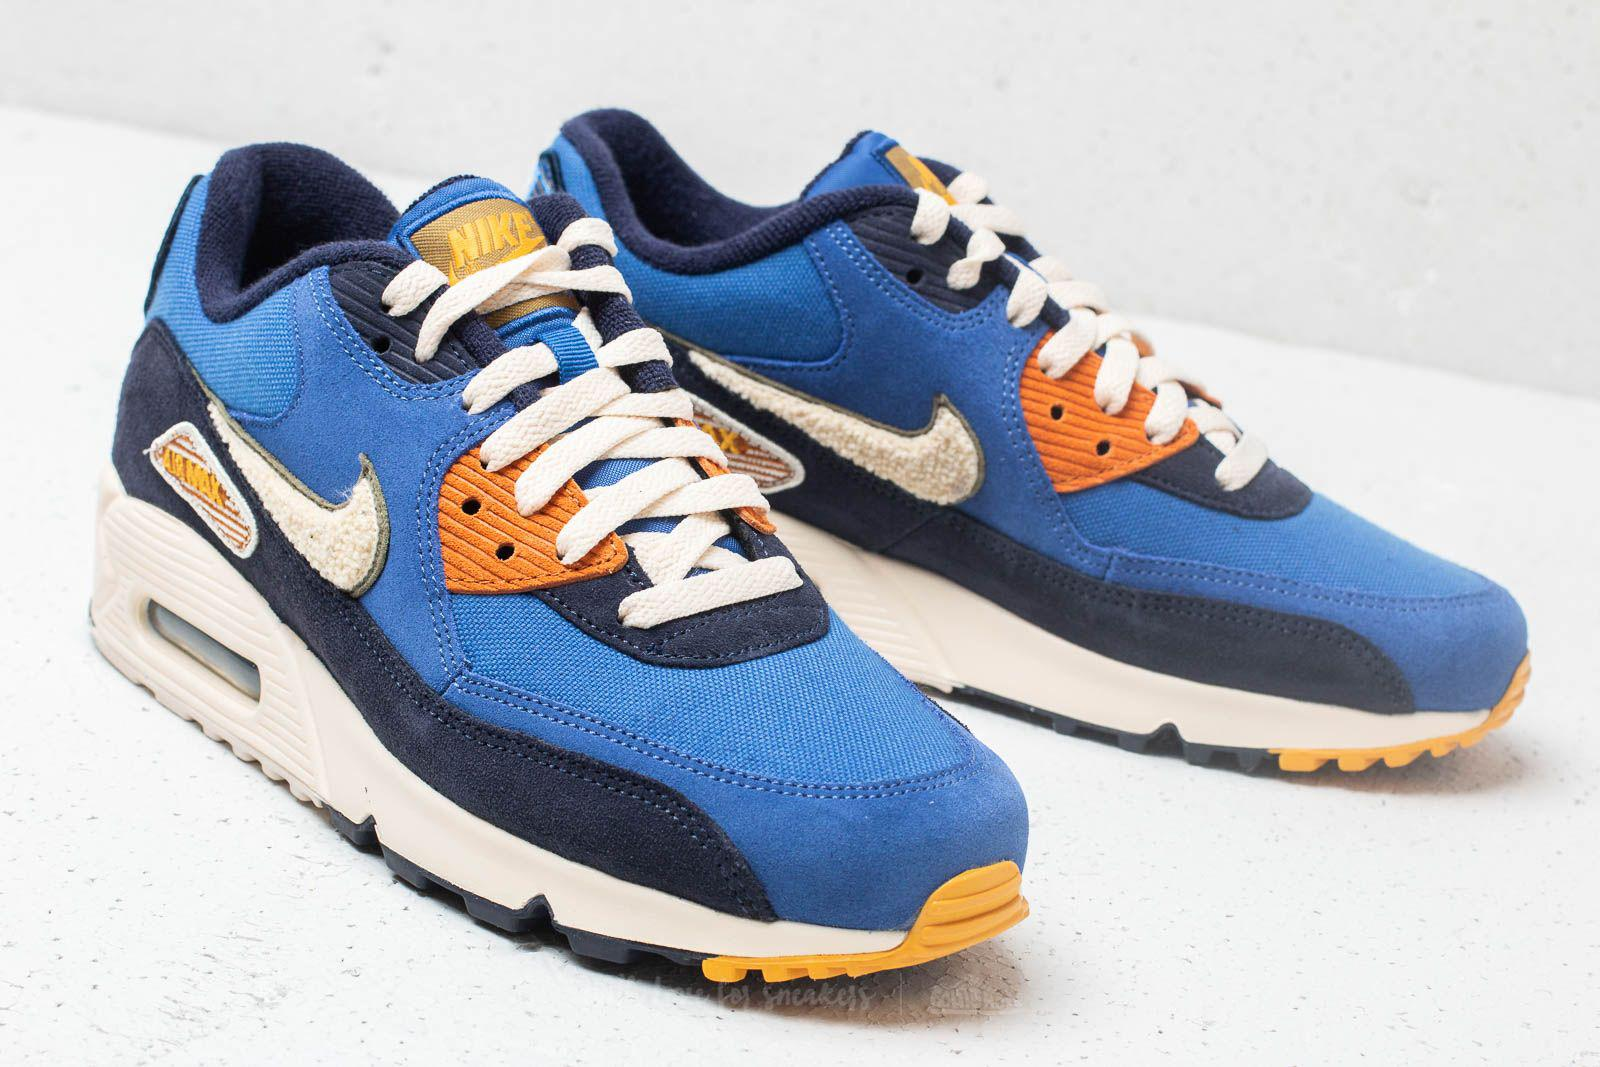 Lyst - Nike Air Max 90 Premium Se Game Royal  Light Cream in Blue ... 84c00c70a